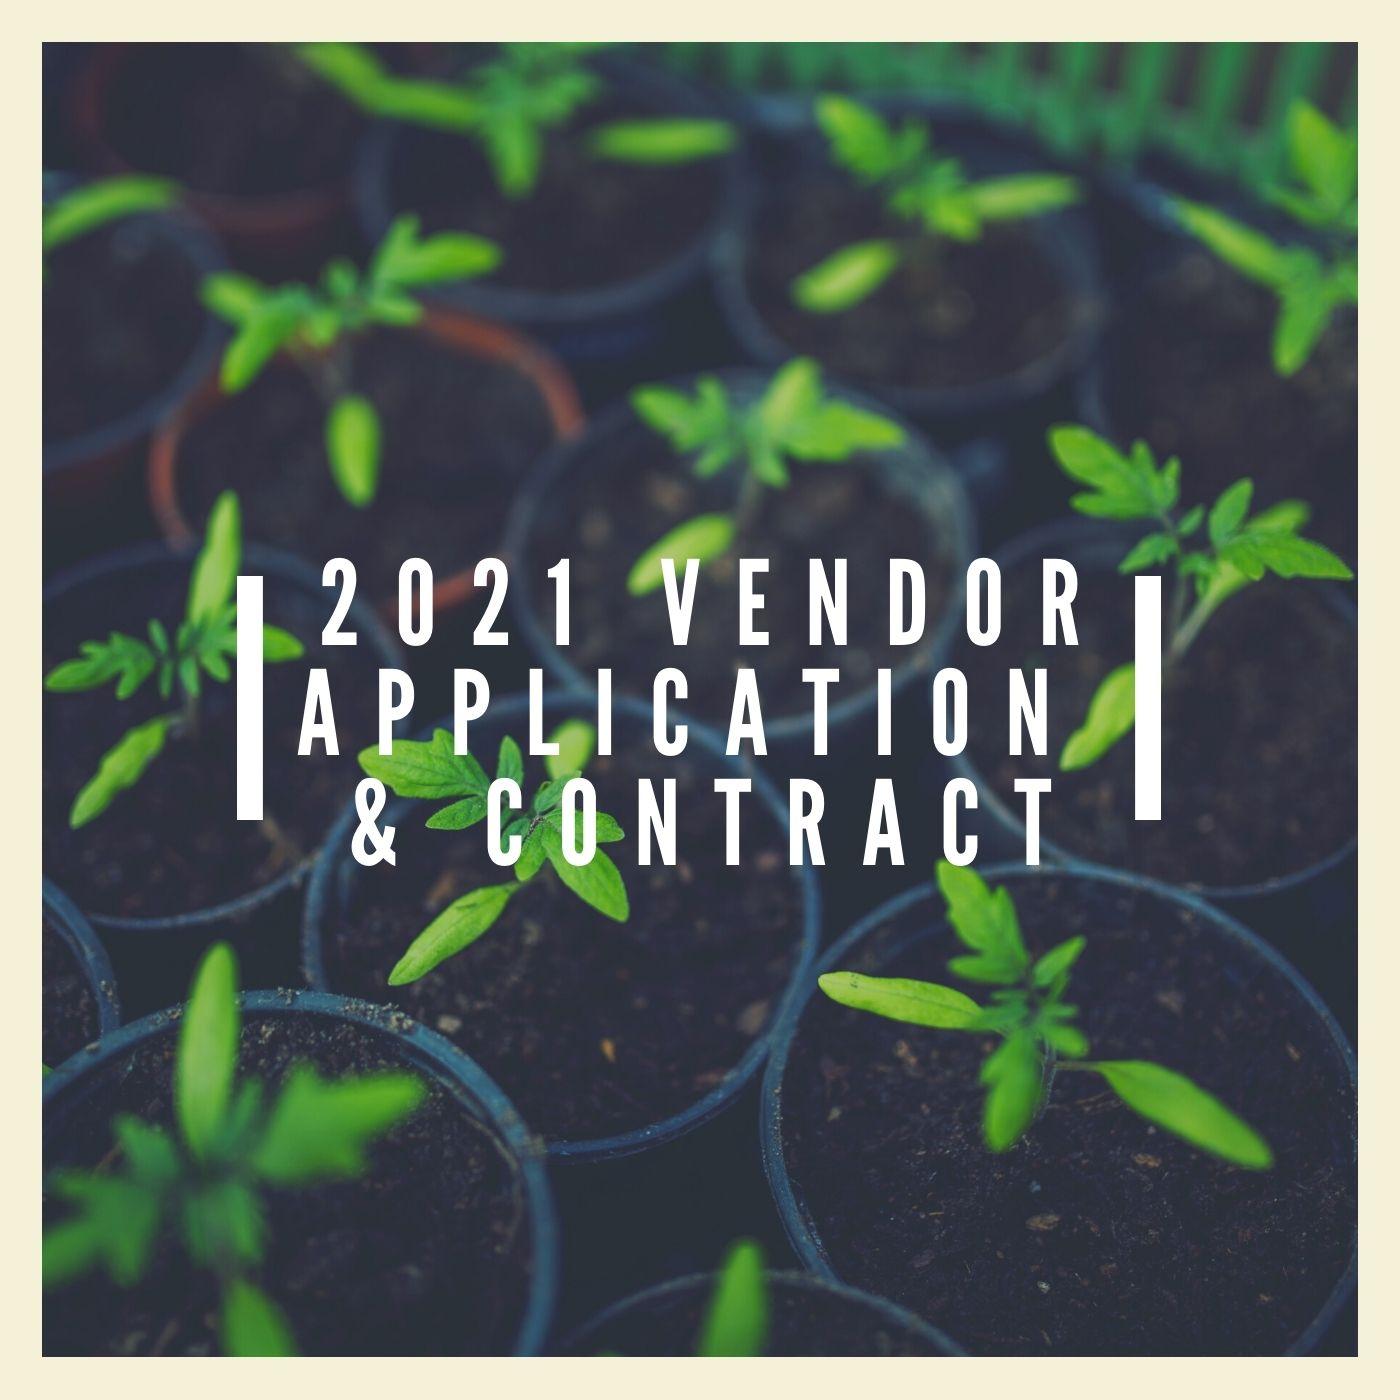 2021 Vendor App